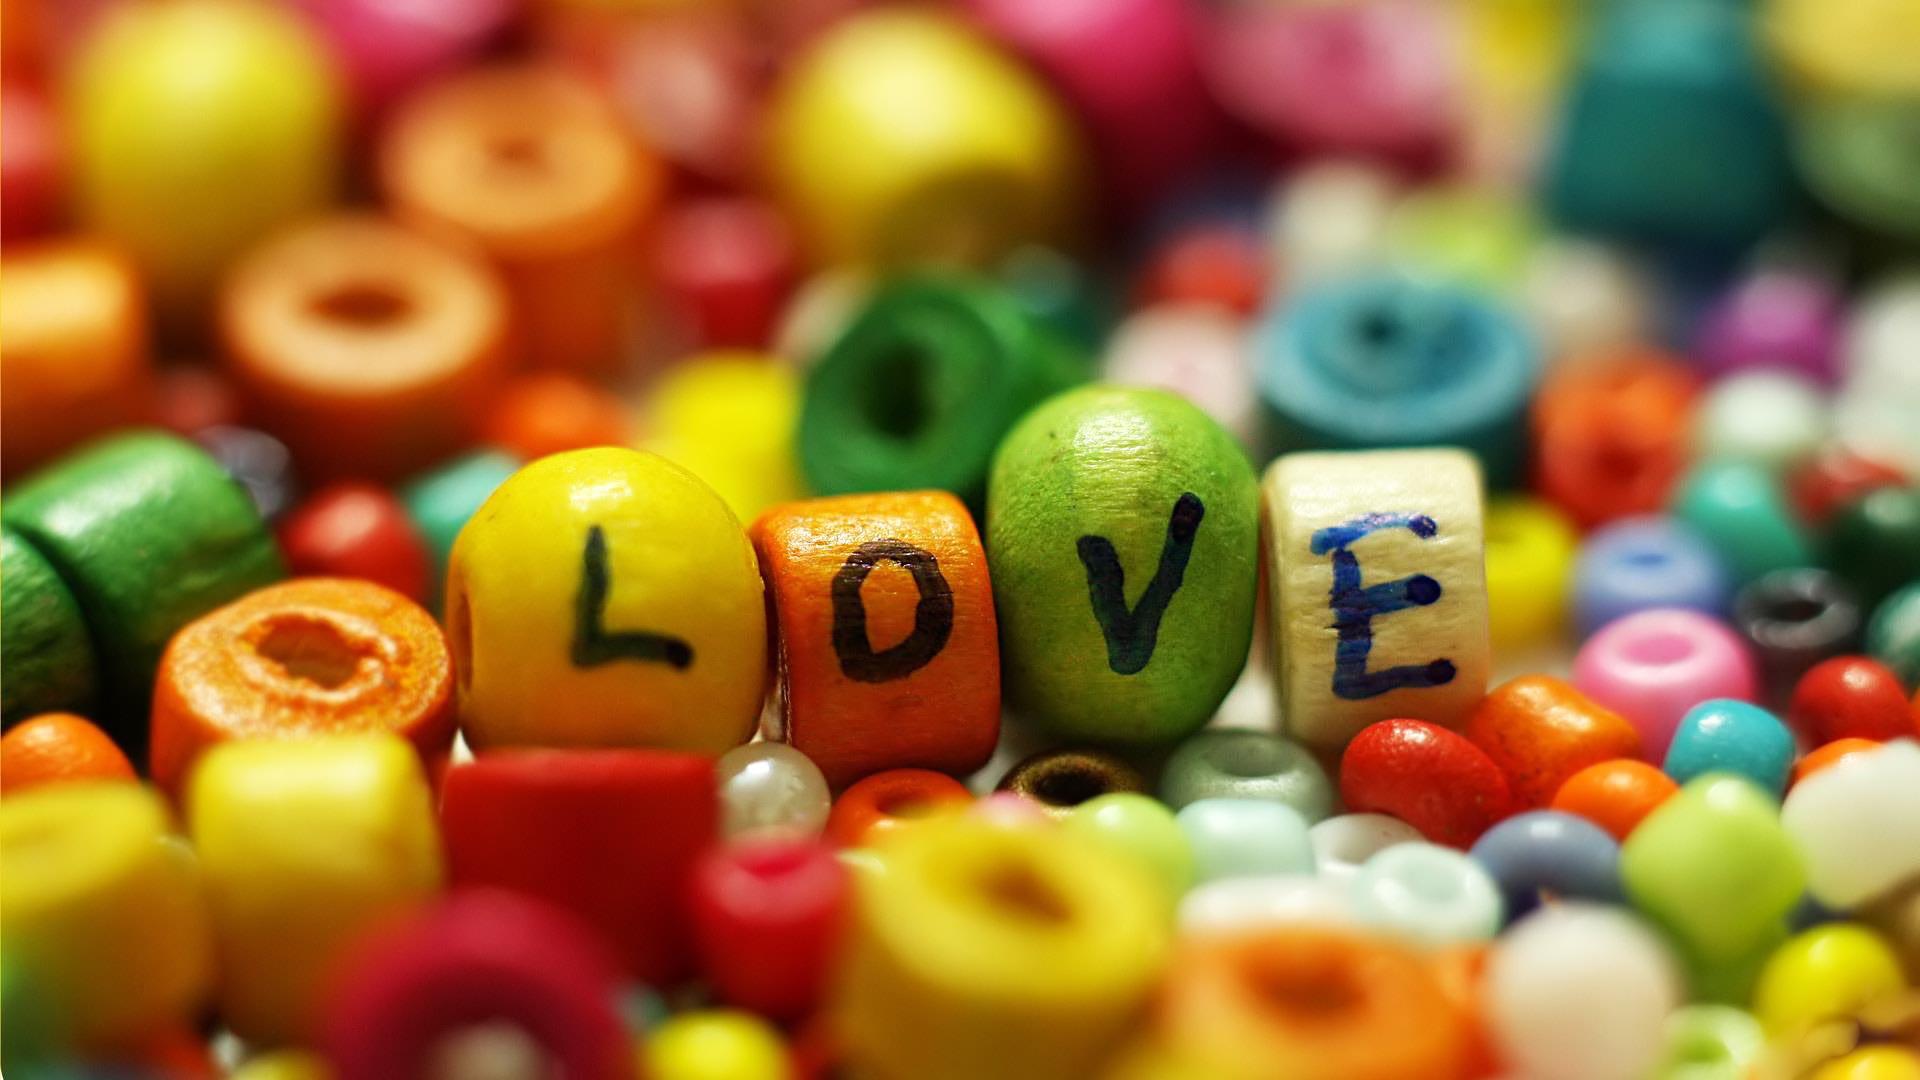 Hd wallpaper love download - Hd Love Wallpaper 39 Wallpapers